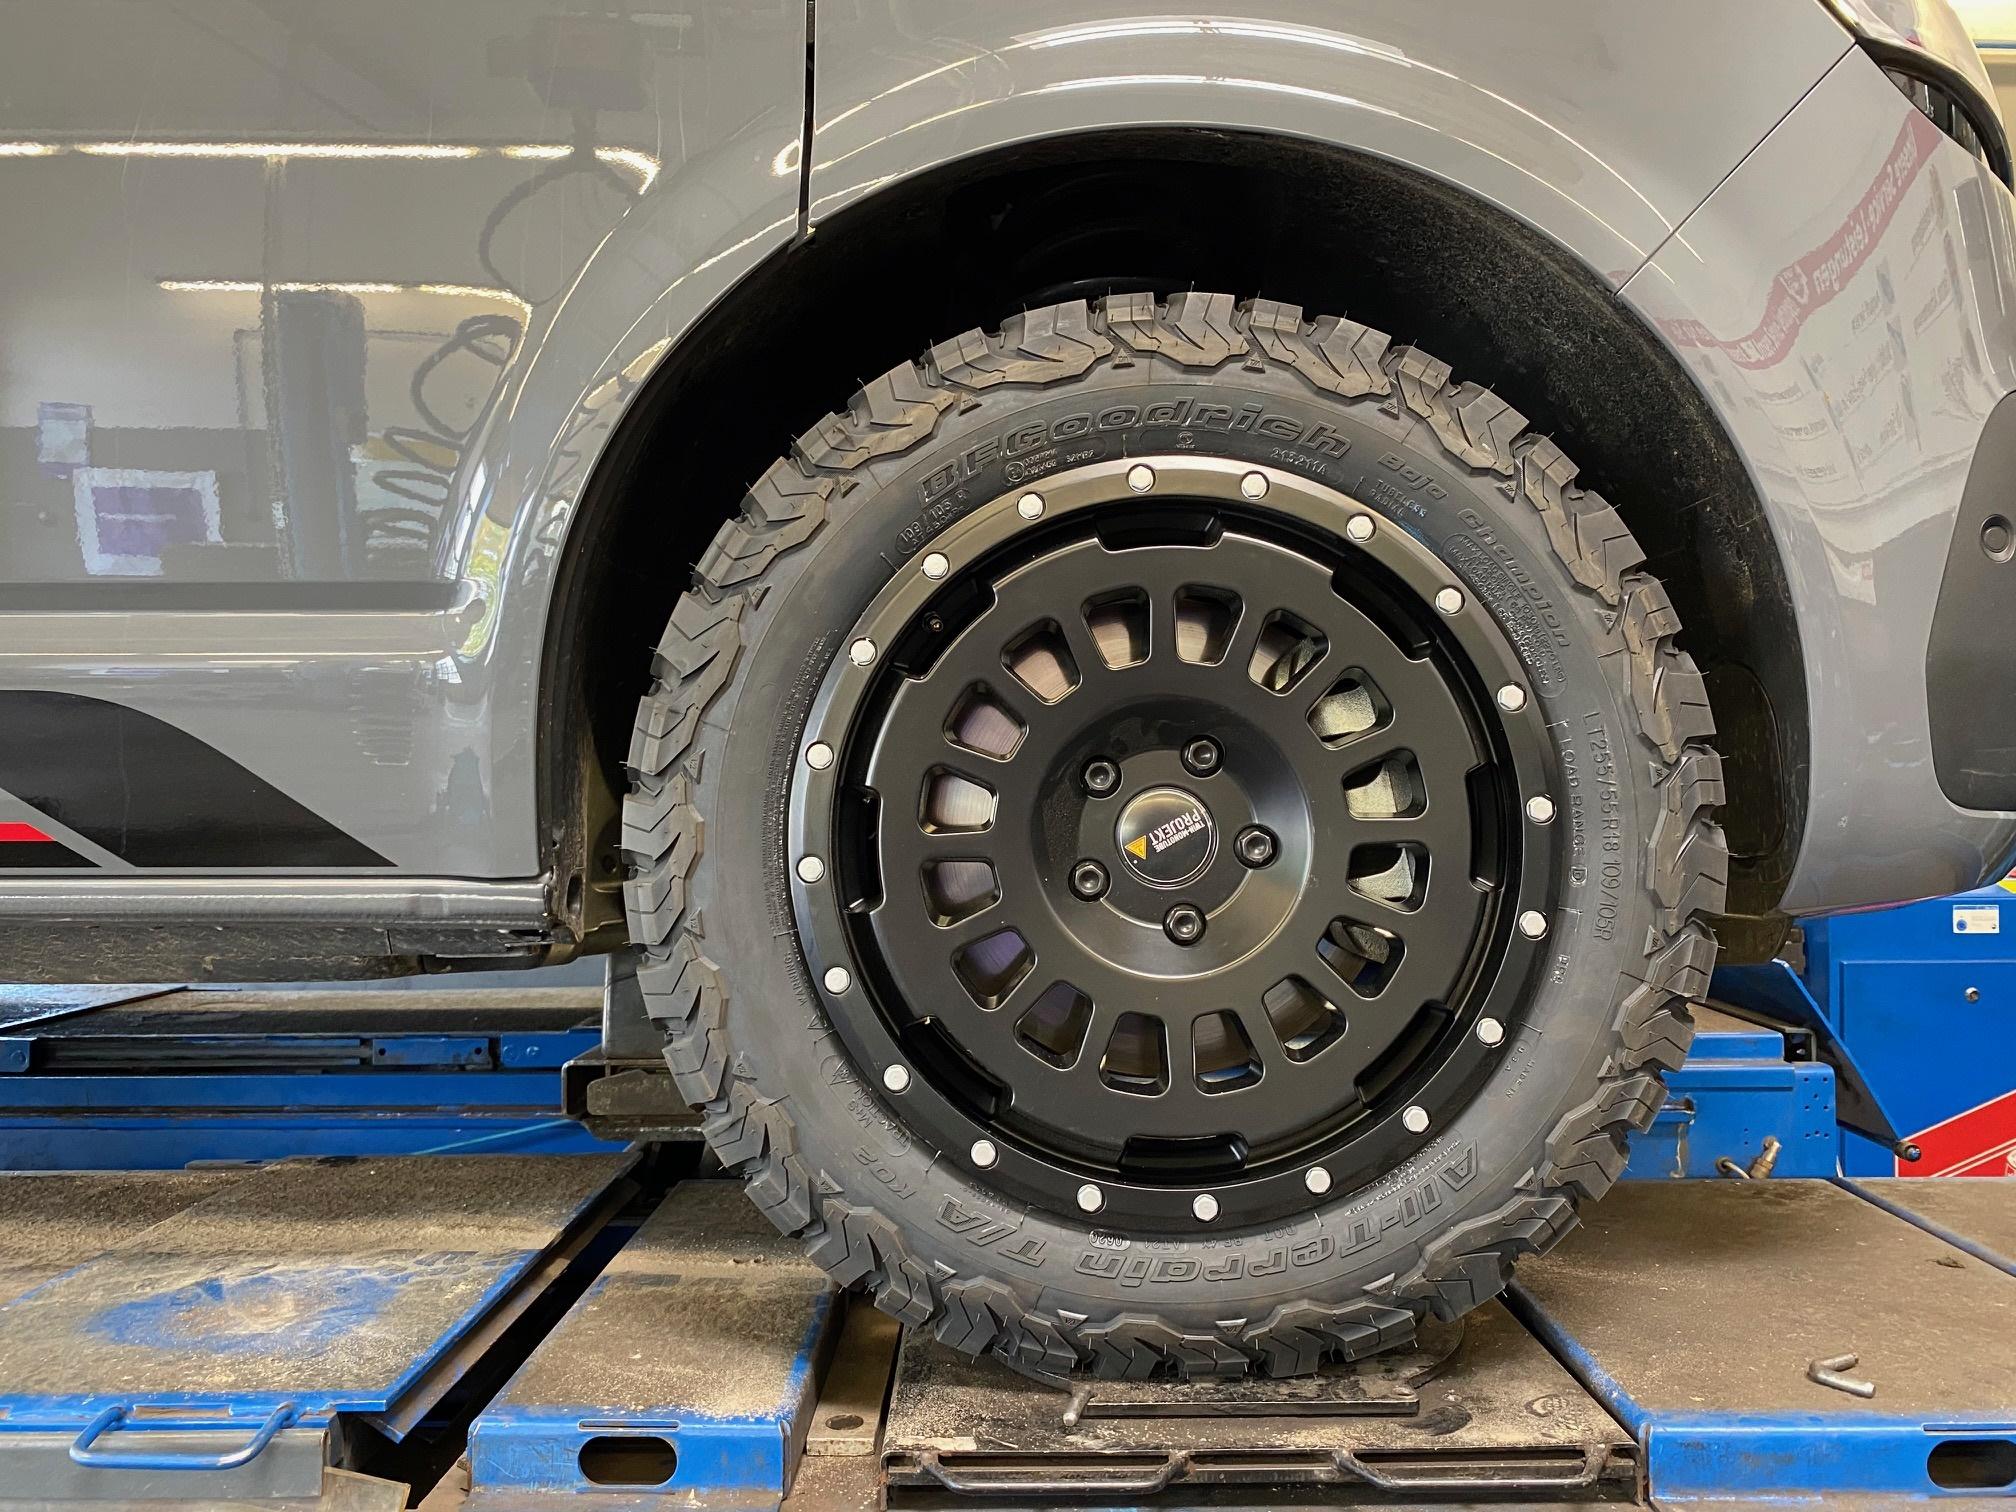 4x Allterrain Felge 8x18 schwarz matt für VW T5 T6 T6.1 Twin Monotube Projekt AT